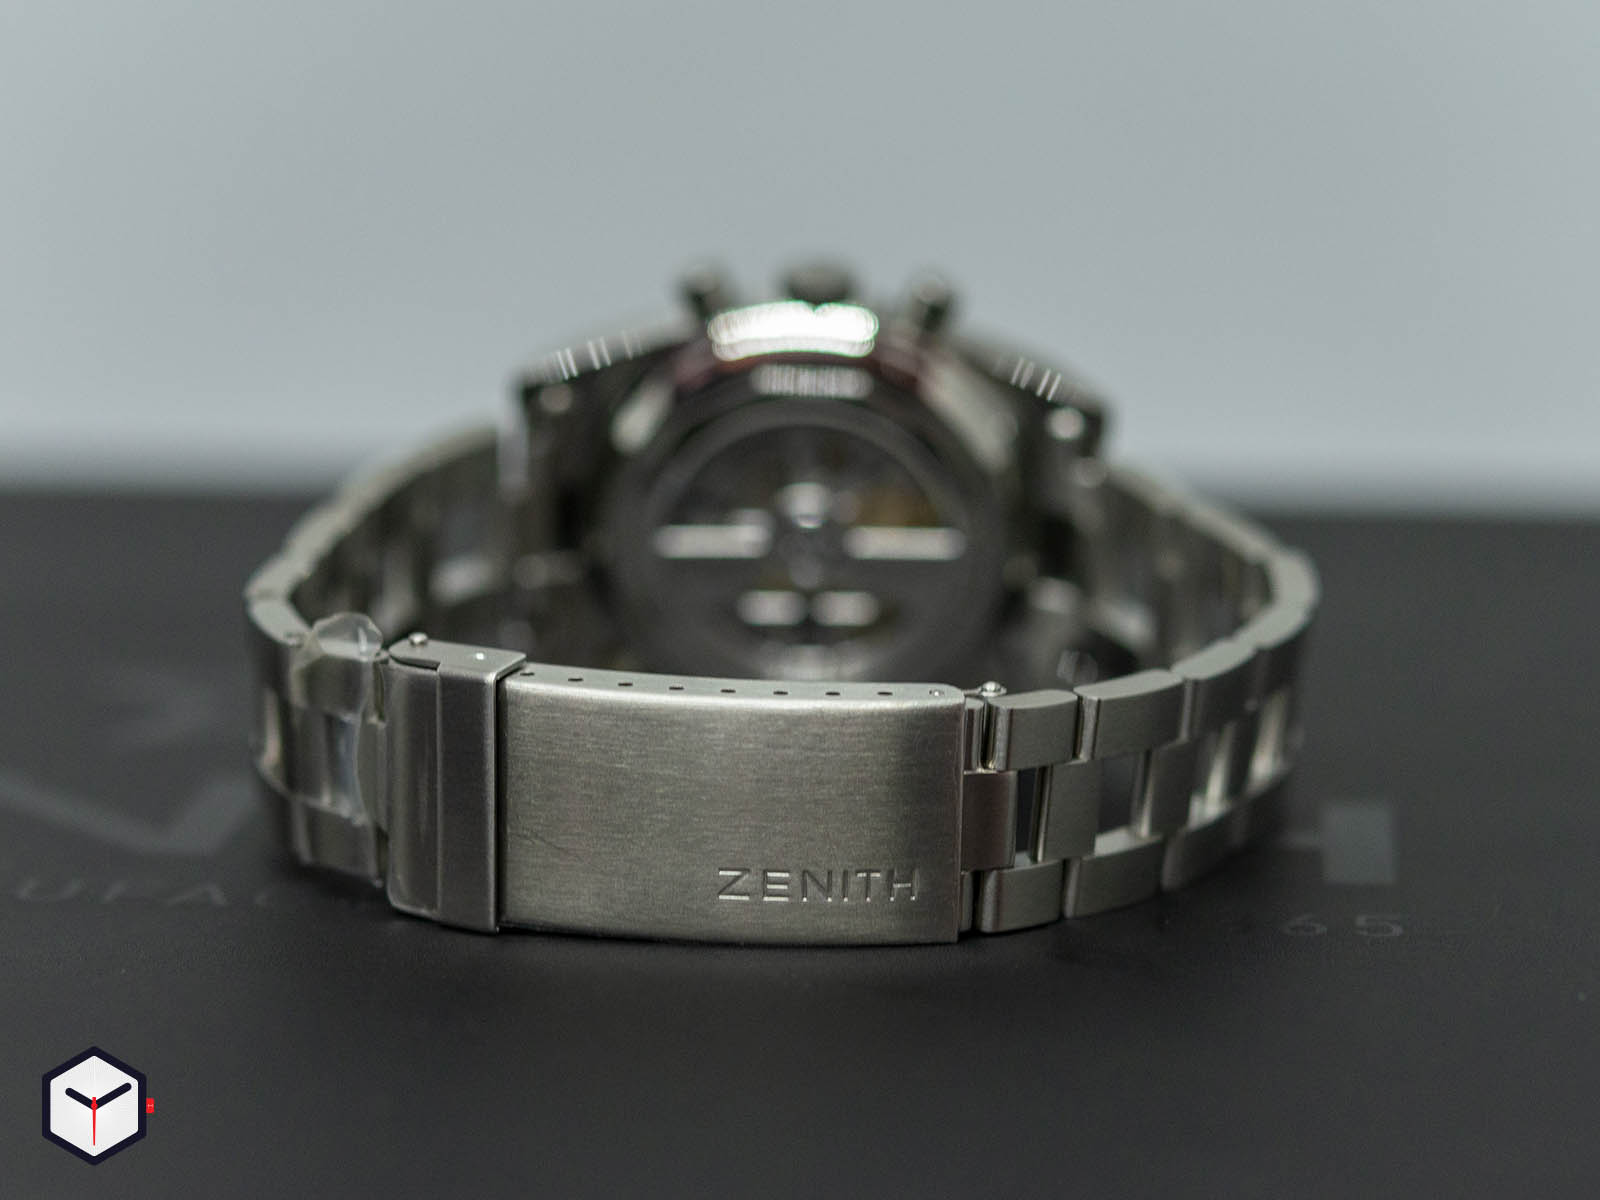 03-a384-400-21-m384-zenith-chronomaster-el-primero-a384-revival-5.jpg